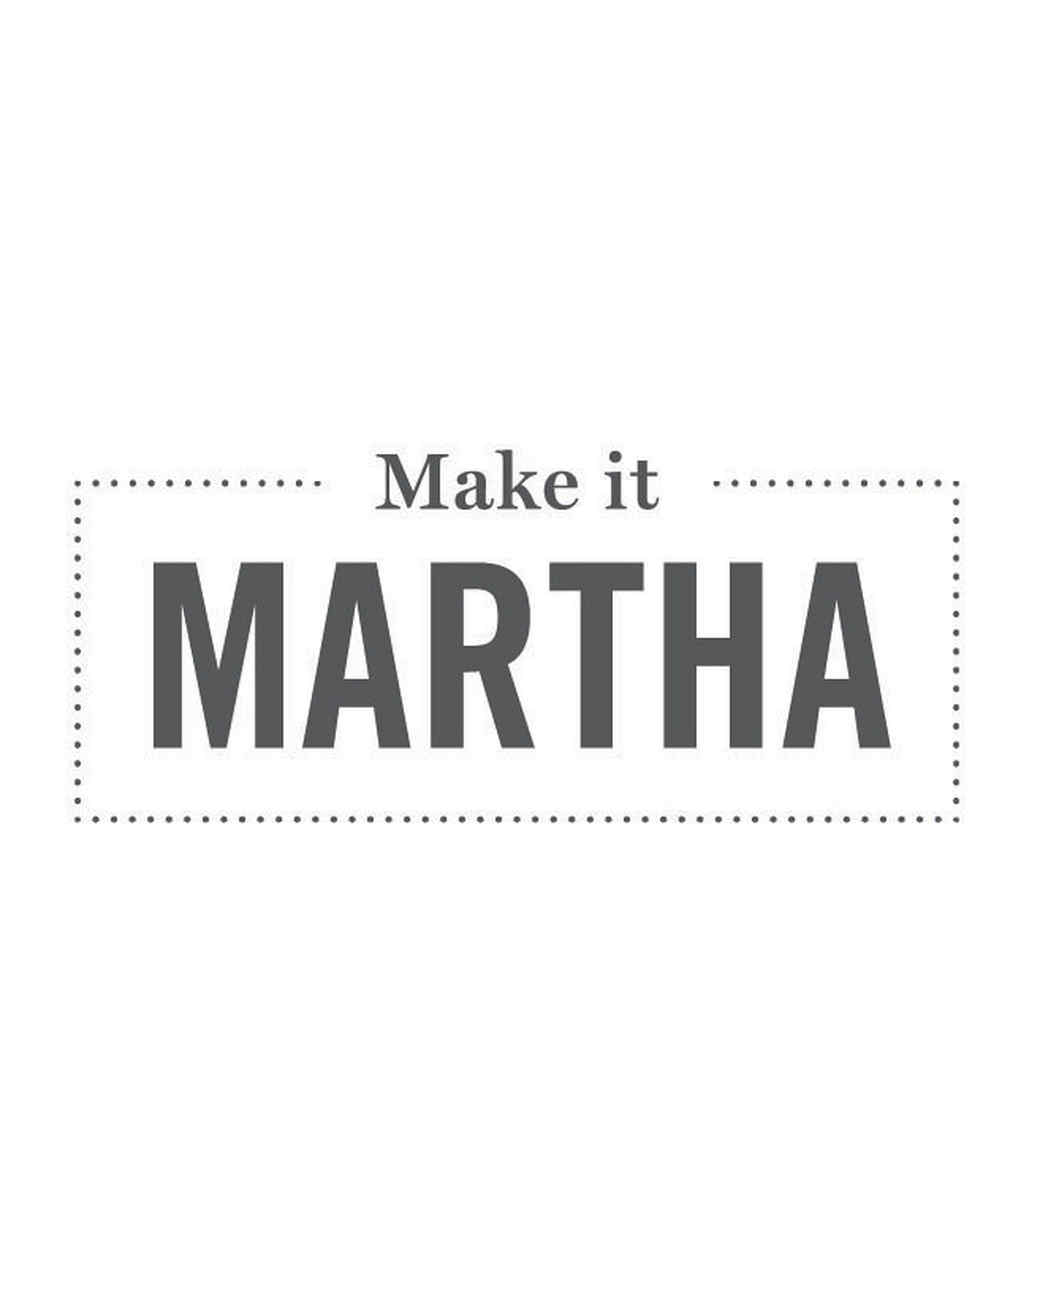 make it martha logo